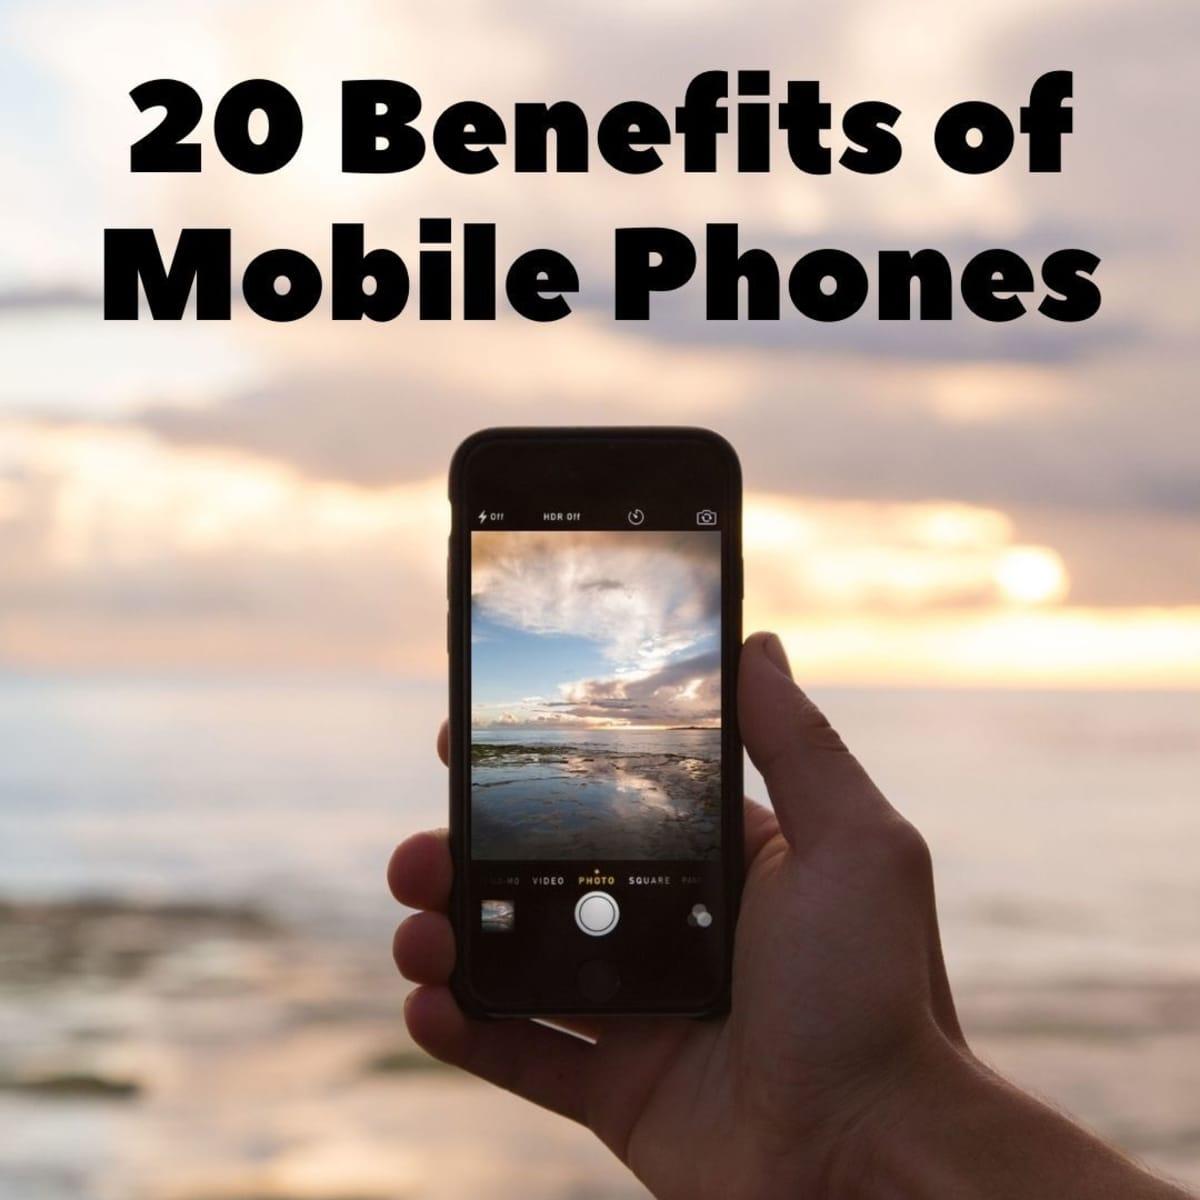 20 Advantages of Mobile Phones - TurboFuture